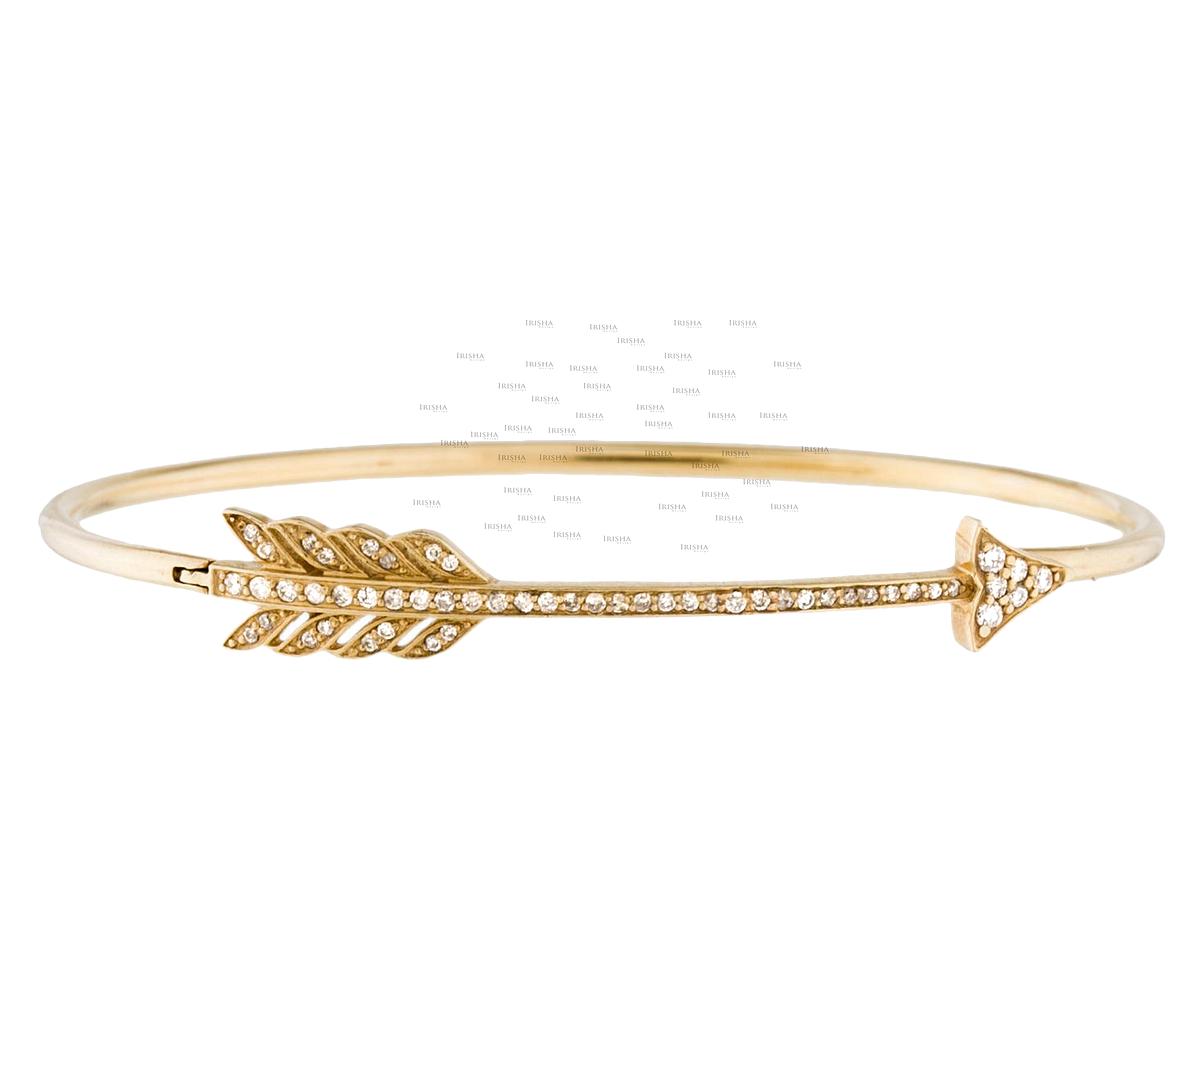 14K Gold 0.31 Ct. Genuine Diamond Arrowhead Bangle Bracelet Fine Jewelry